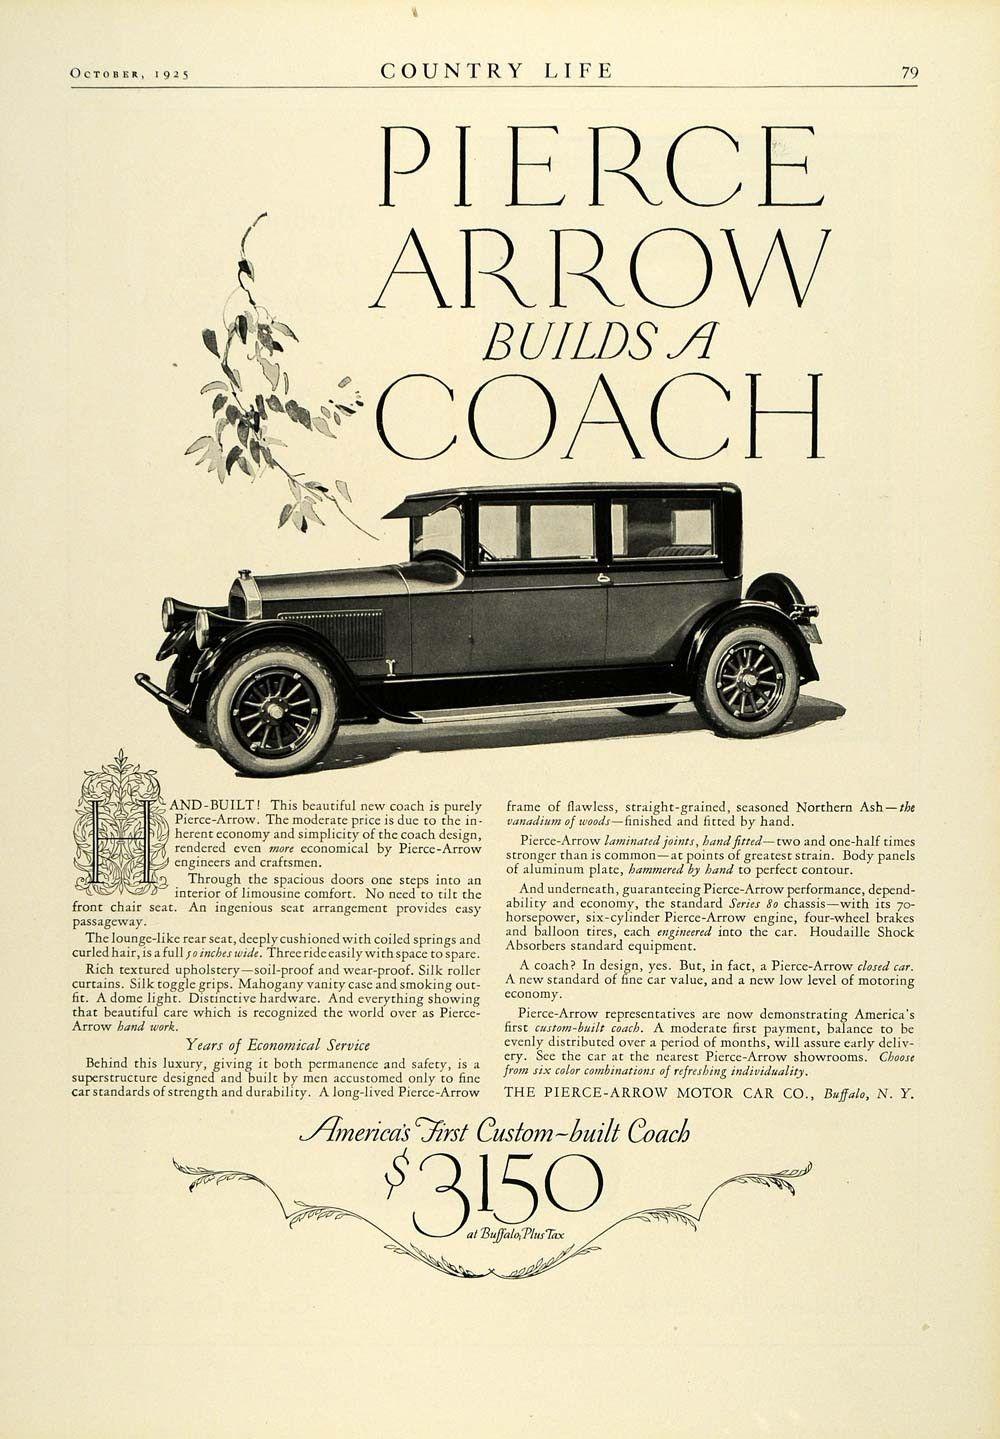 1925 Ad Pierce Arrow Motor Car Co Buffalo Ny Coach Vintage Automobile Col2 Motor Car Vintage Cars Vintage Coach